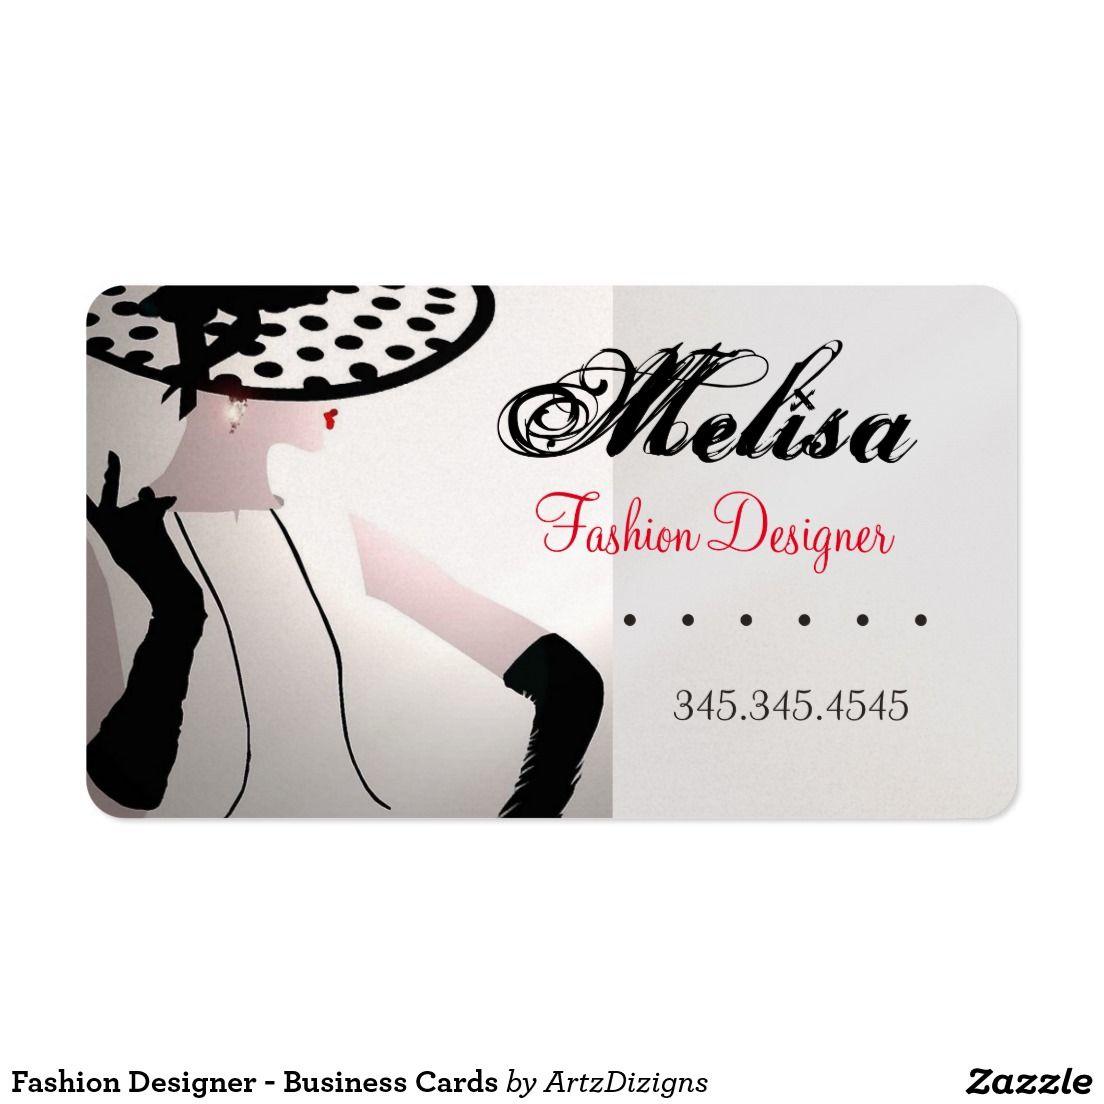 Fashion Designer - Business Cards  http://www.zazzle.com/artzdizigns&rf=238365382999242687